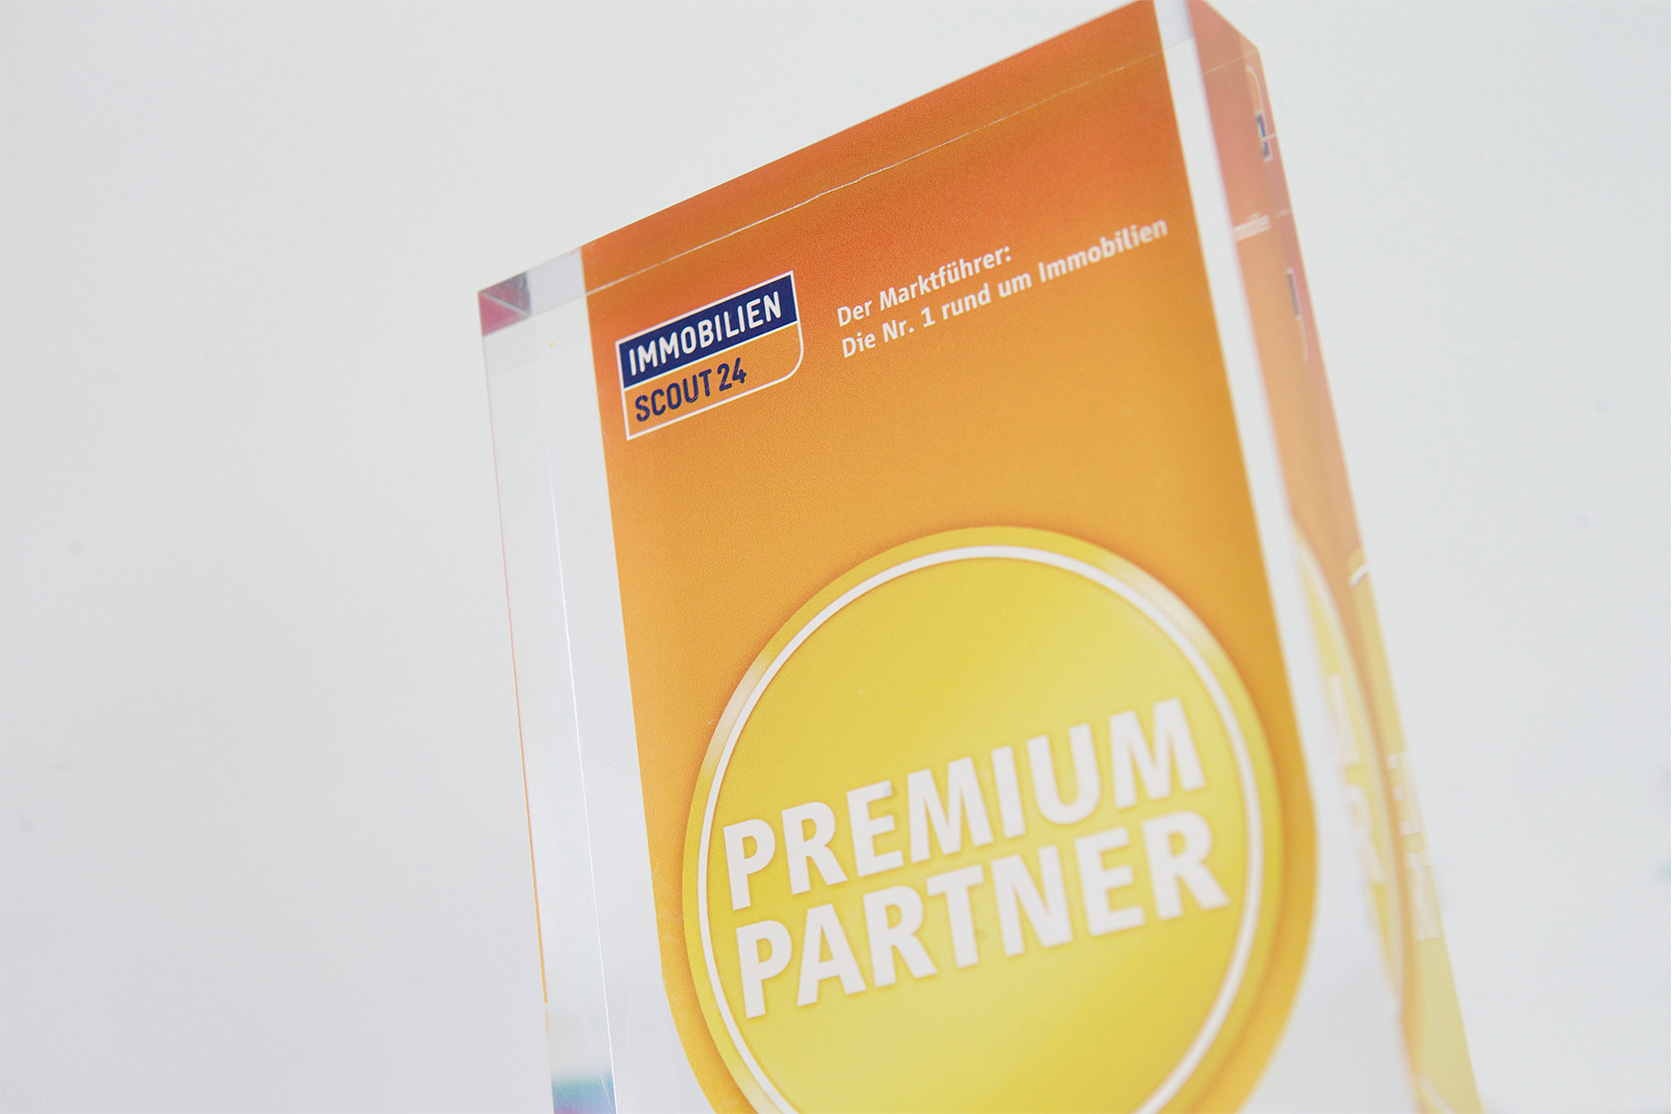 Premium Partner Immobilienscout